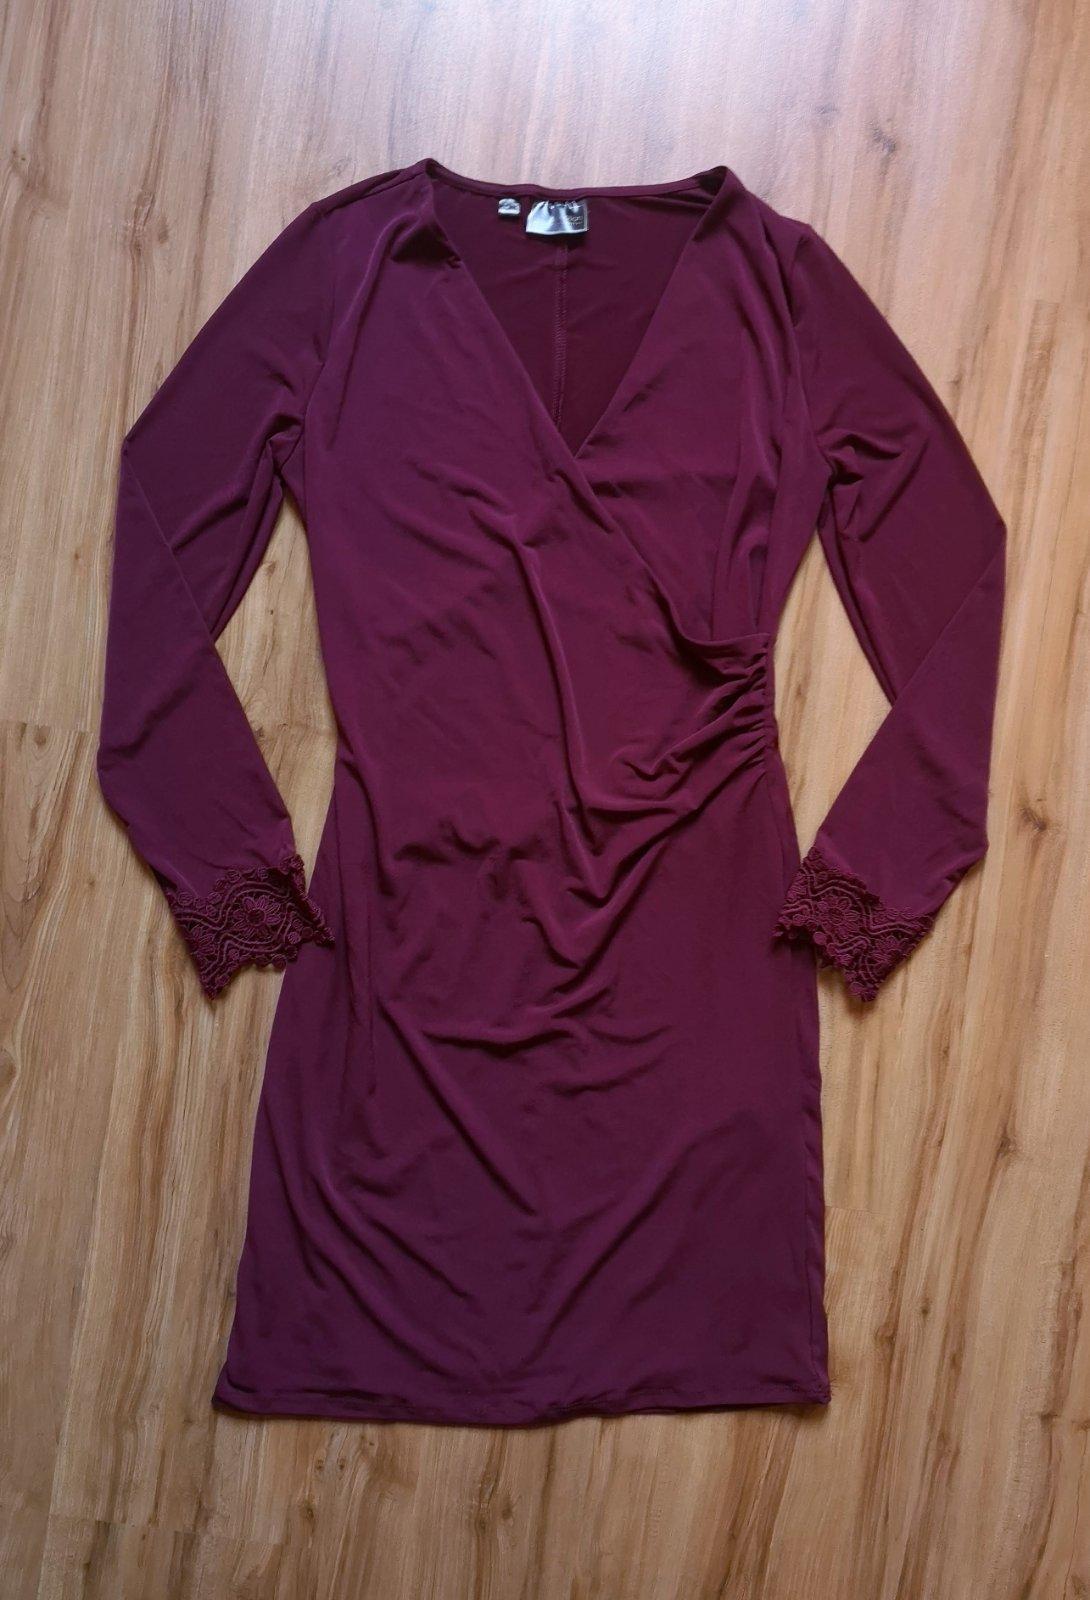 šaty s ozdobnými rukávmi - Obrázok č. 2